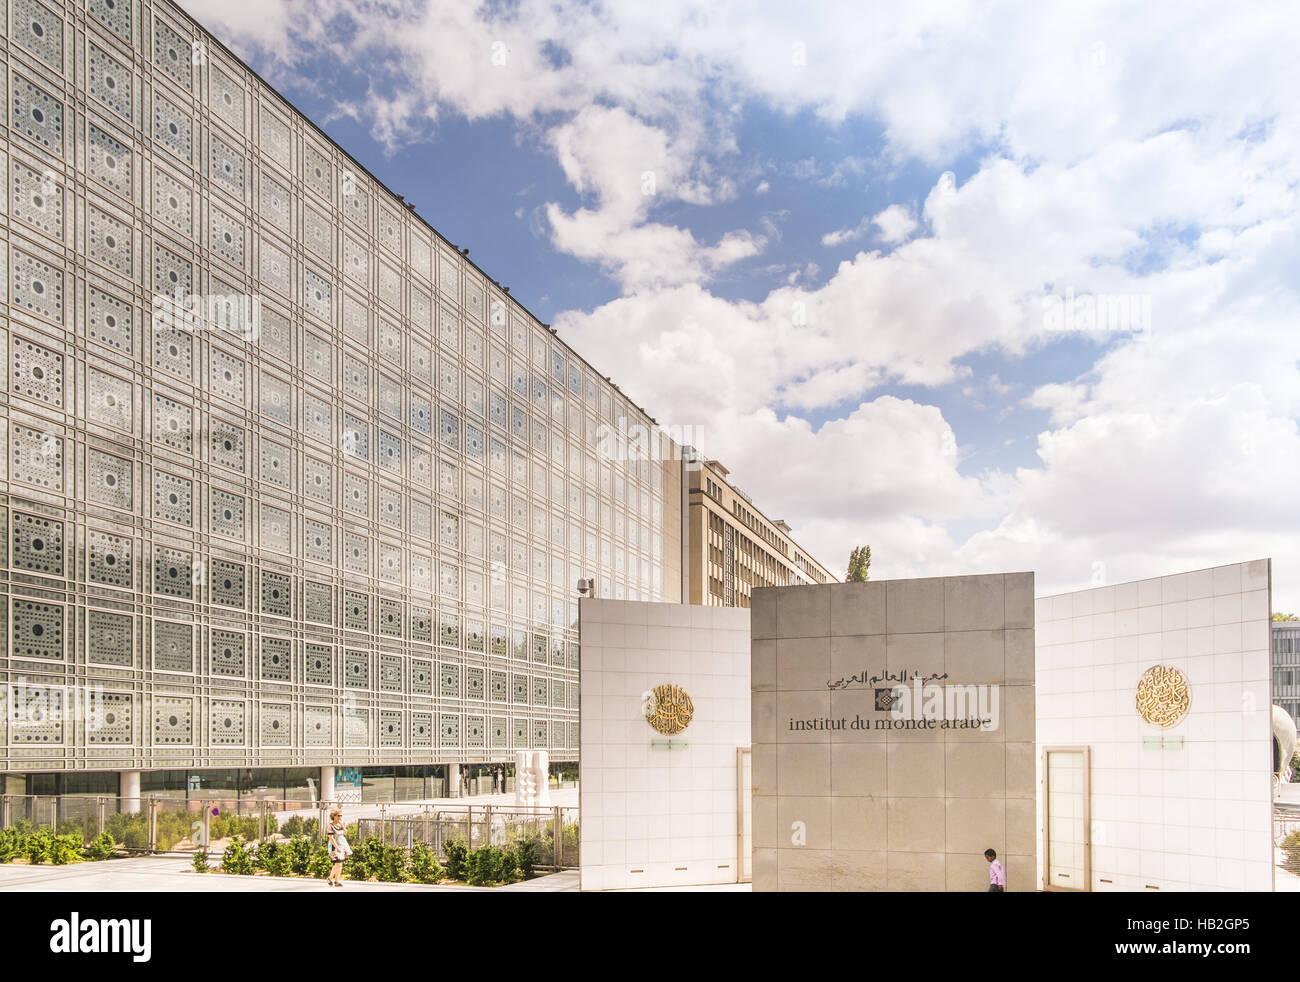 arab world institute - Stock Image